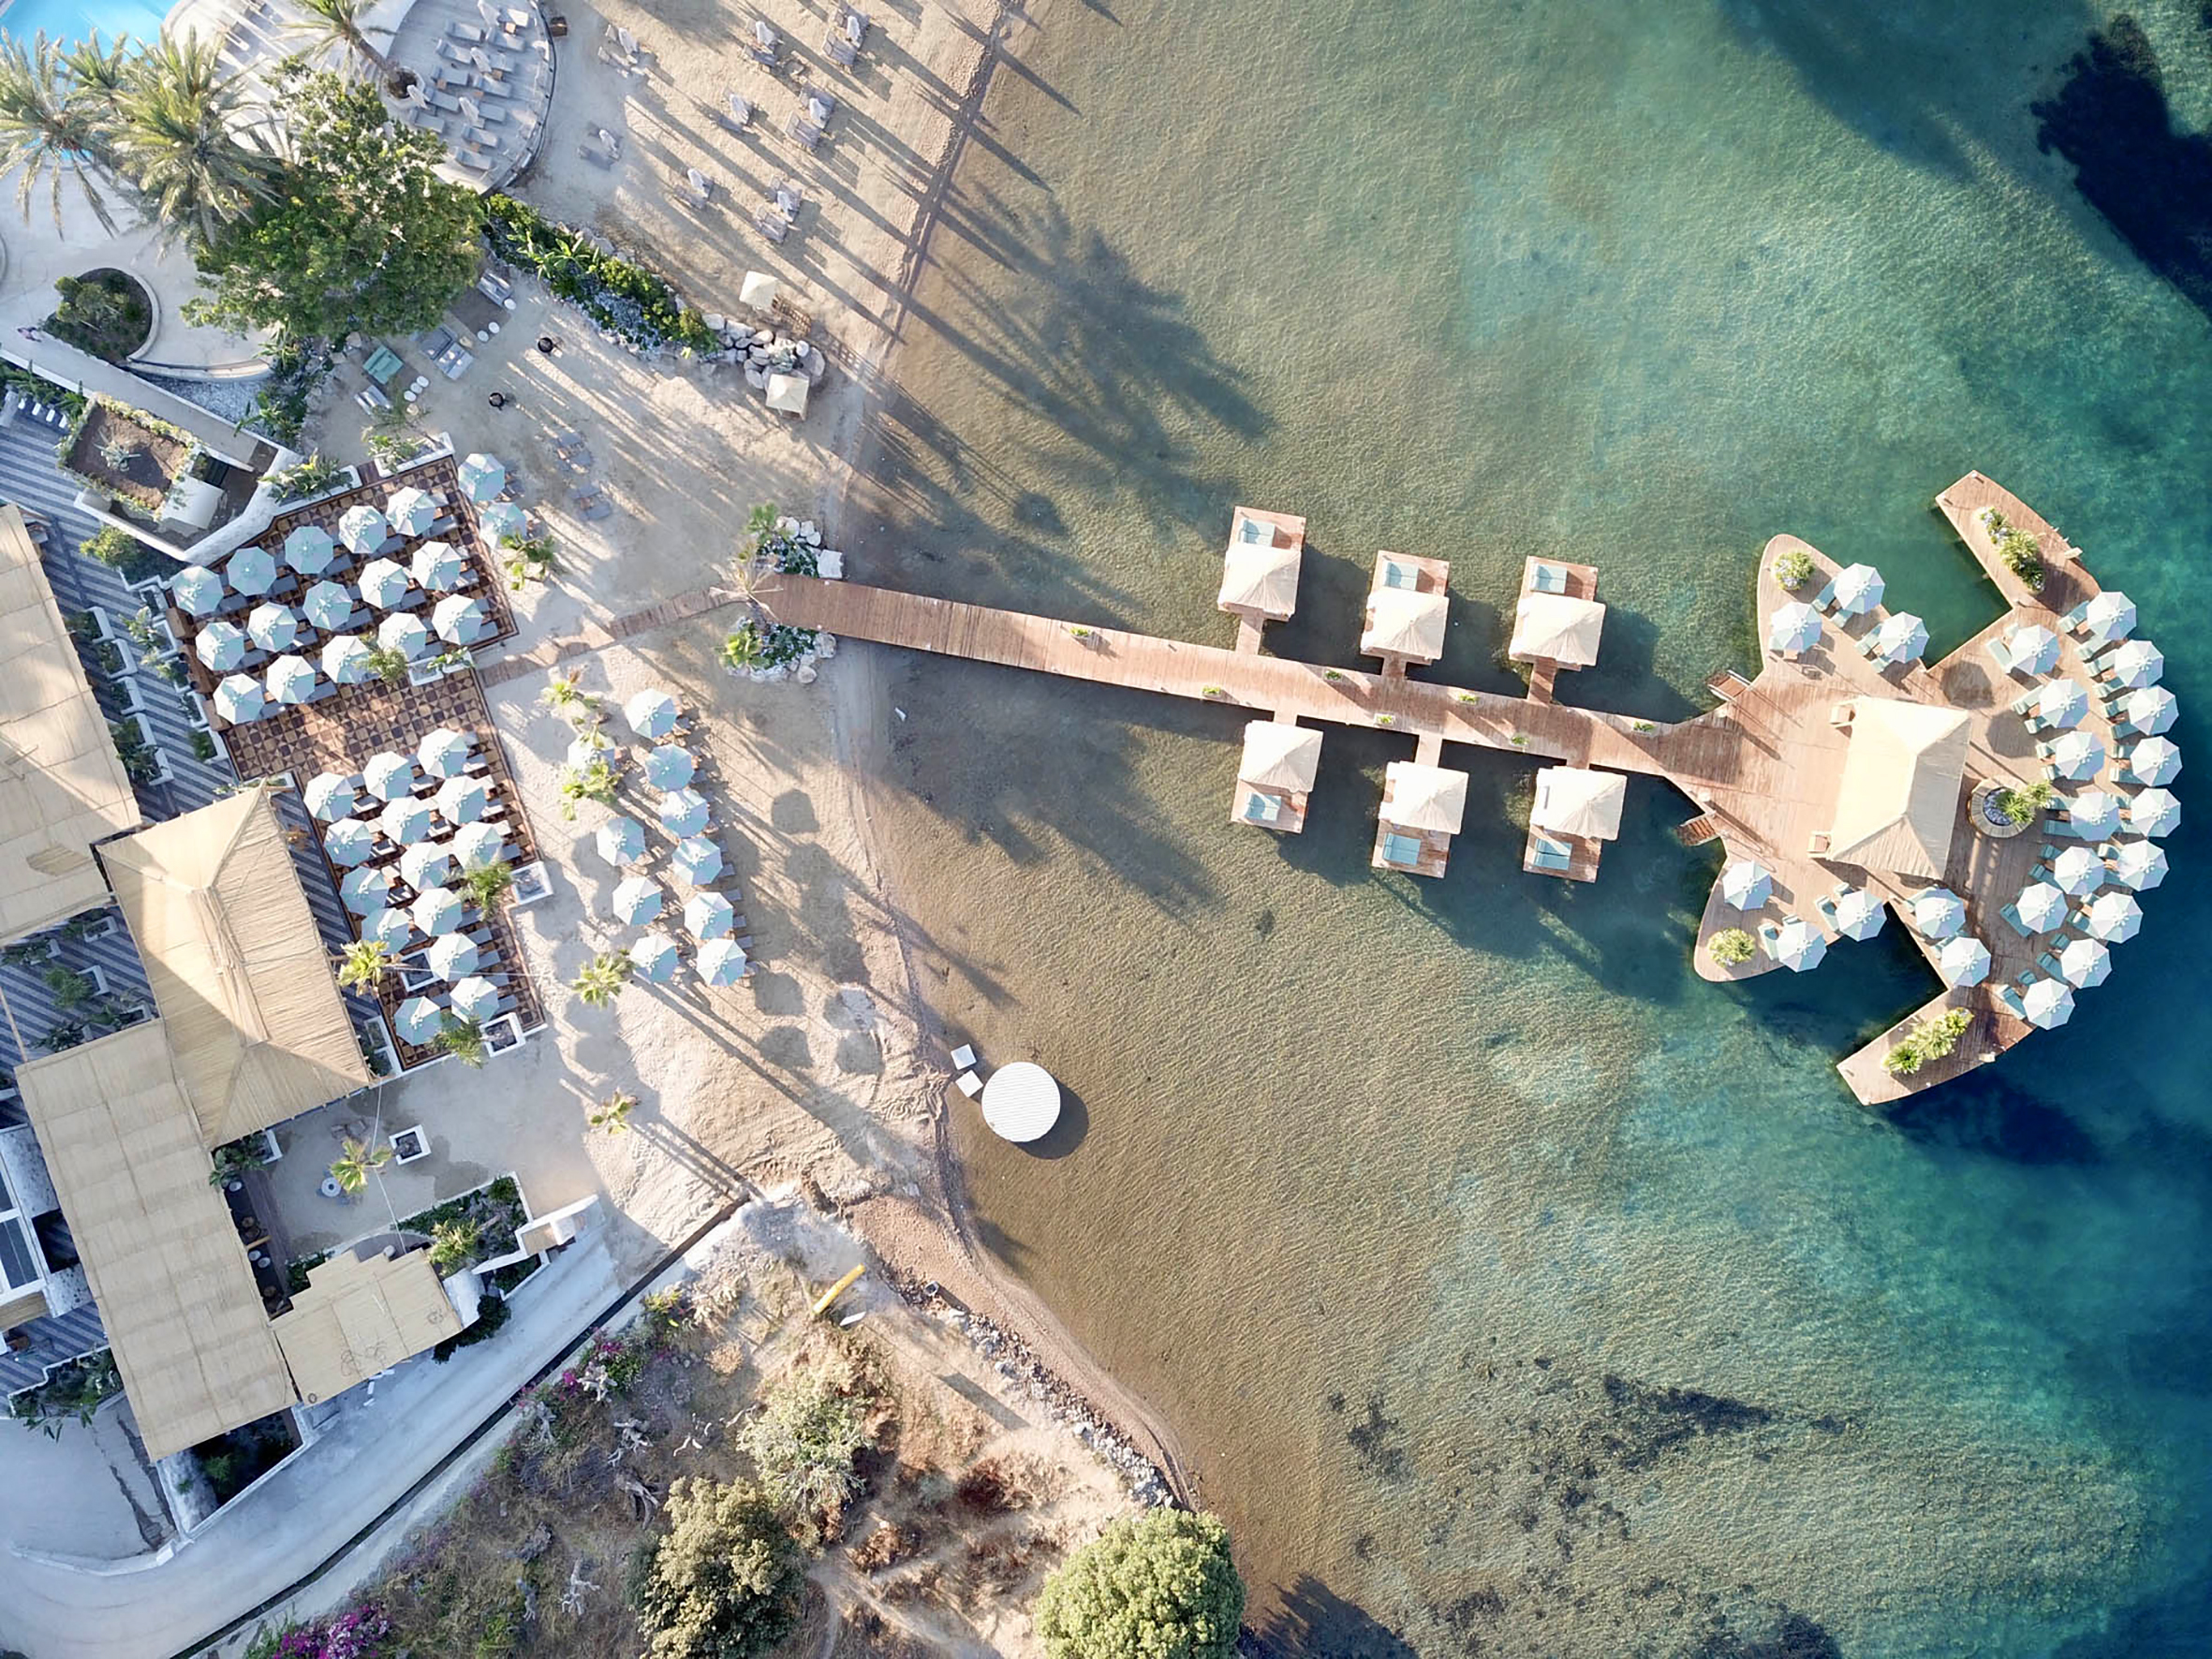 Dünyaca ünlü Villa Azur Restaurant & Beach Club Bodrum'da!